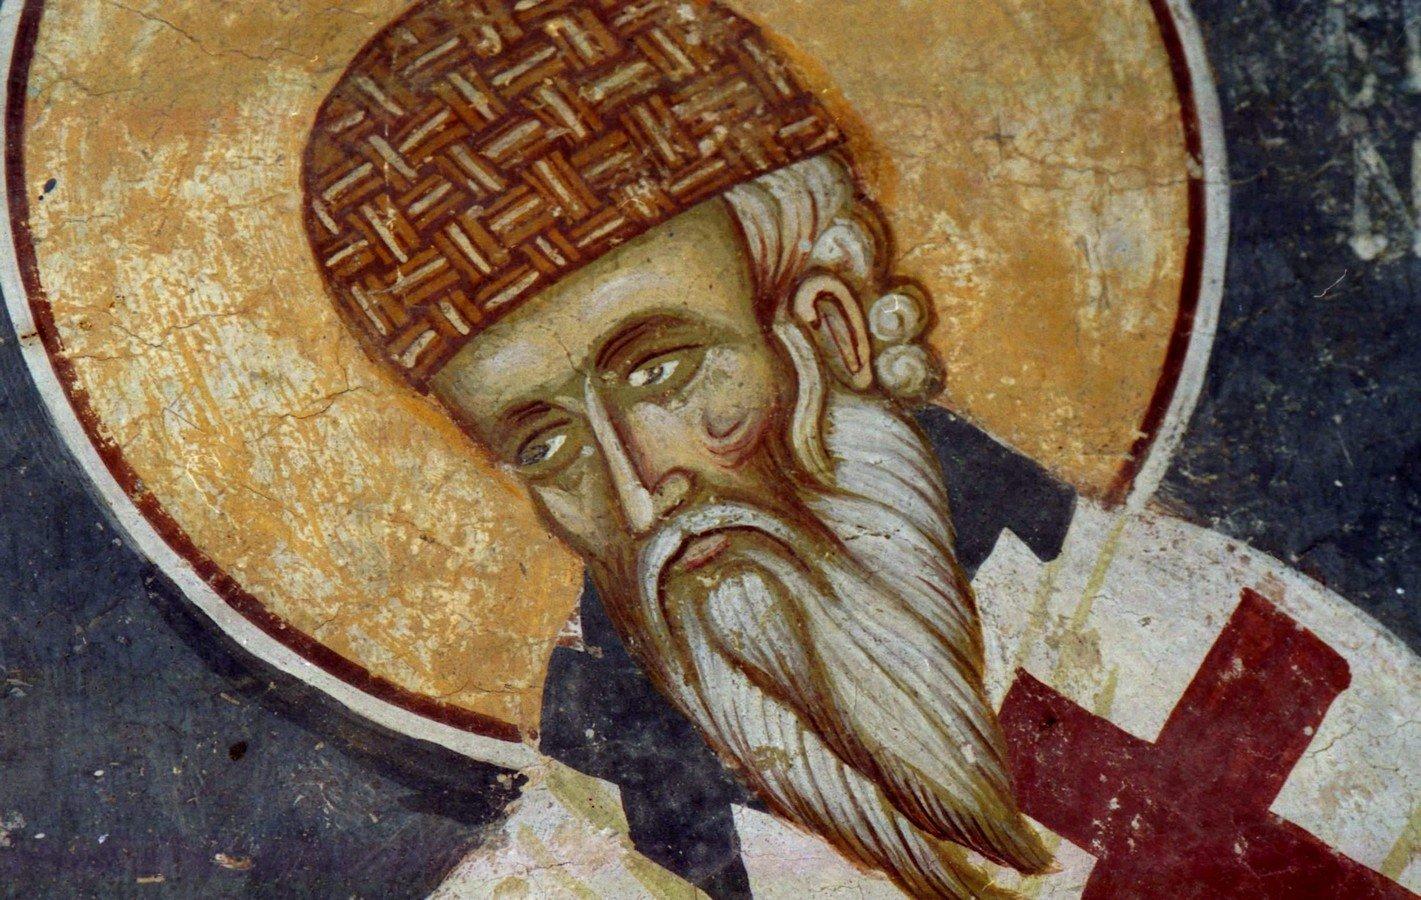 Святитель Спиридон, Епископ Тримифунтский, Чудотворец. Фреска церкви Спаса в Кучевиште, Македония. 1330 - 1340-е годы.